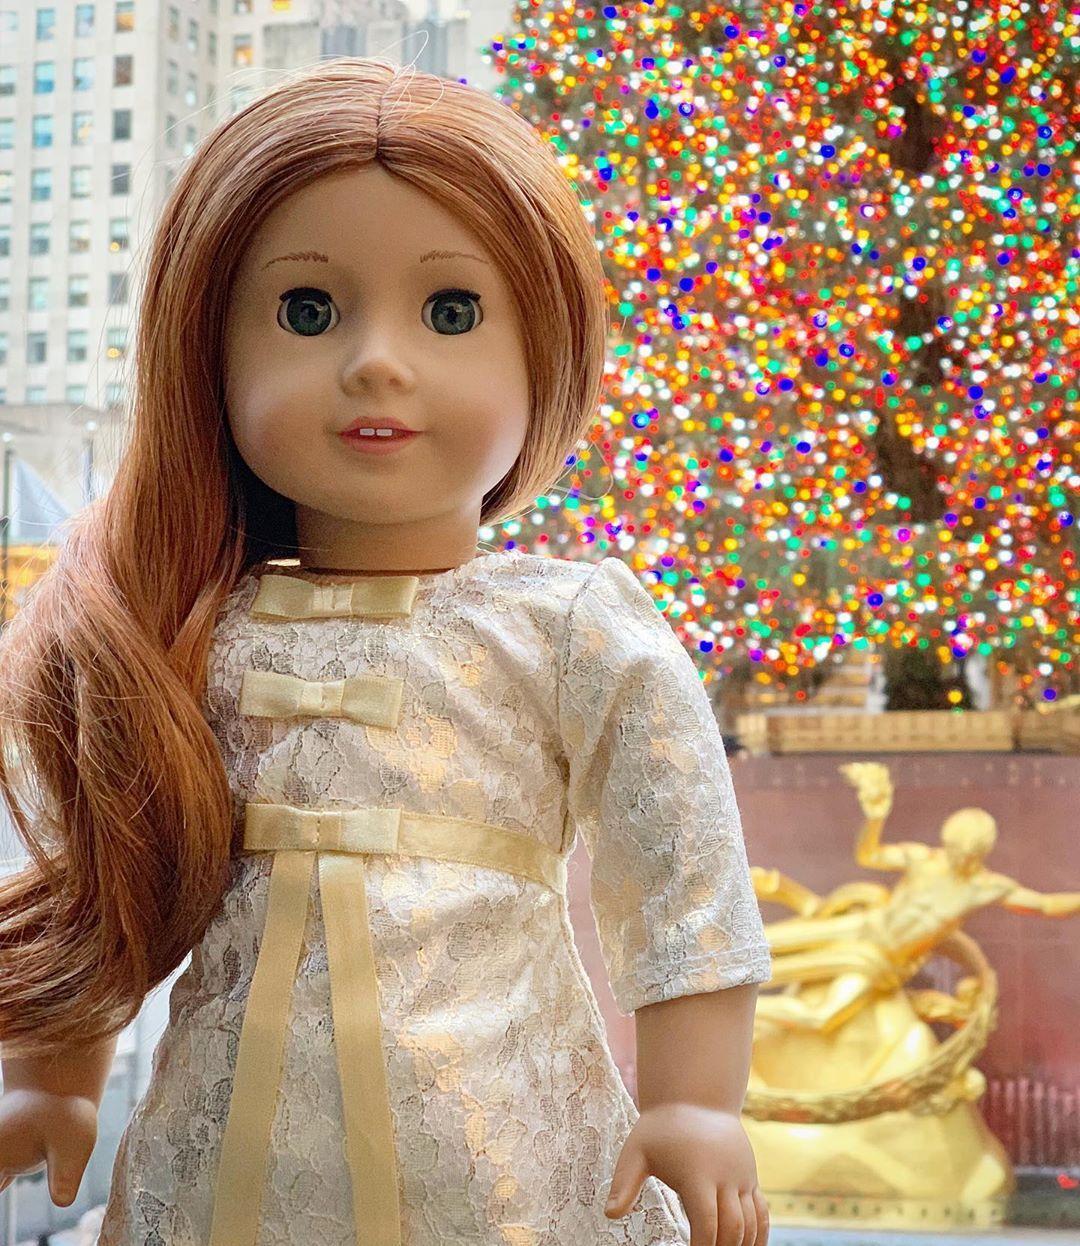 "Colleen Rachelle on Instagram: ""Merry Christmas! 🎅🏻🎄🎁🗽🌟 #agig #americangirlbrand #americangirl #mattel #trulyme61 #nyc #toyphotography #rockefellerchristmastree"""